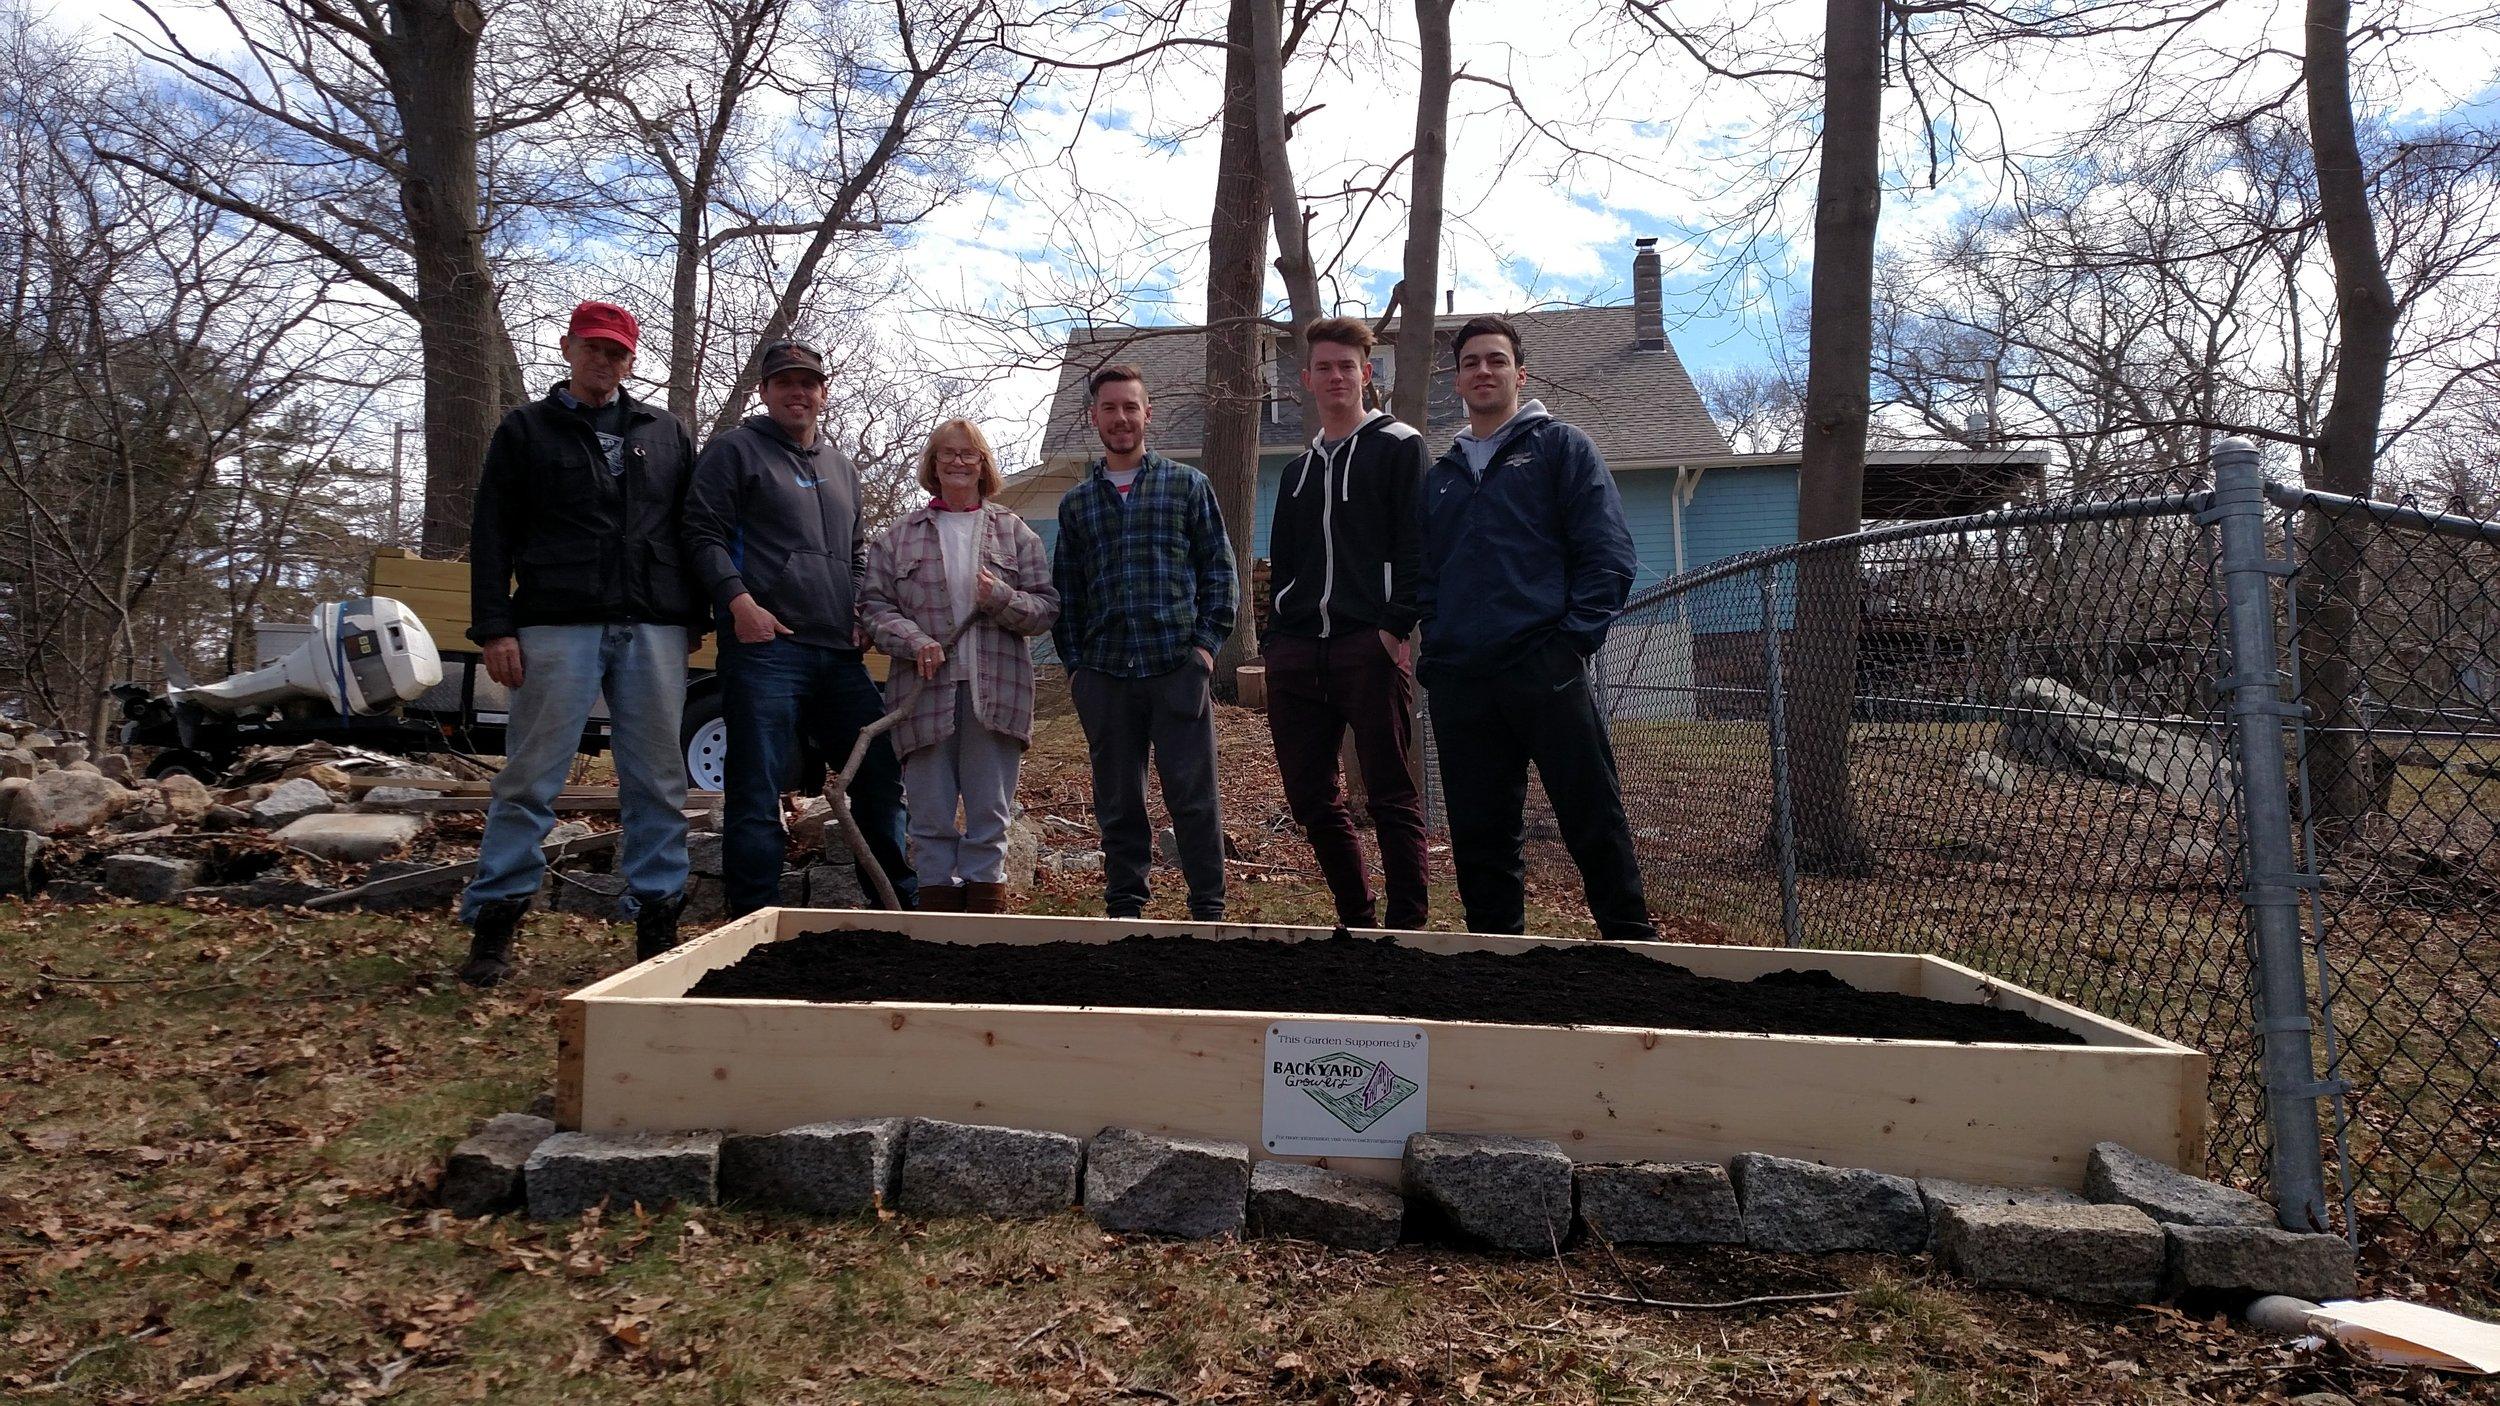 Endicott College Soccer team helped build Pat's garden bed.